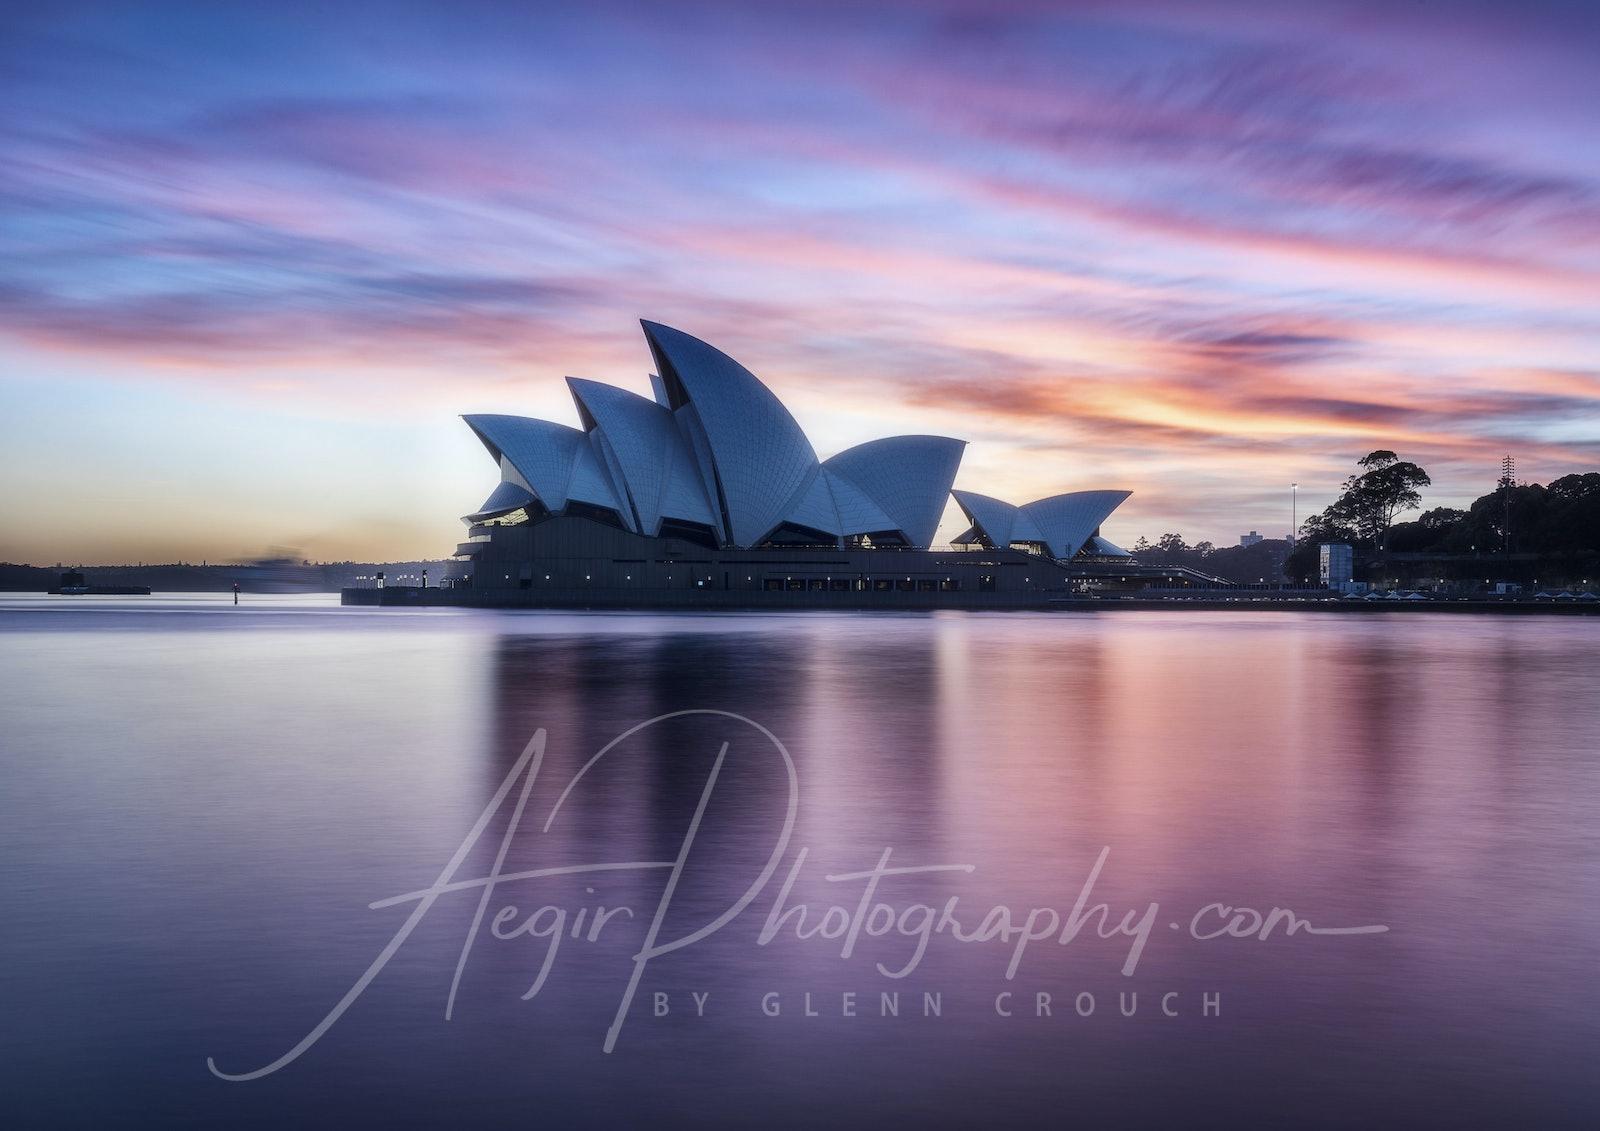 Opera House Dawn IV - Sunrise colour over the Sydney Opera House